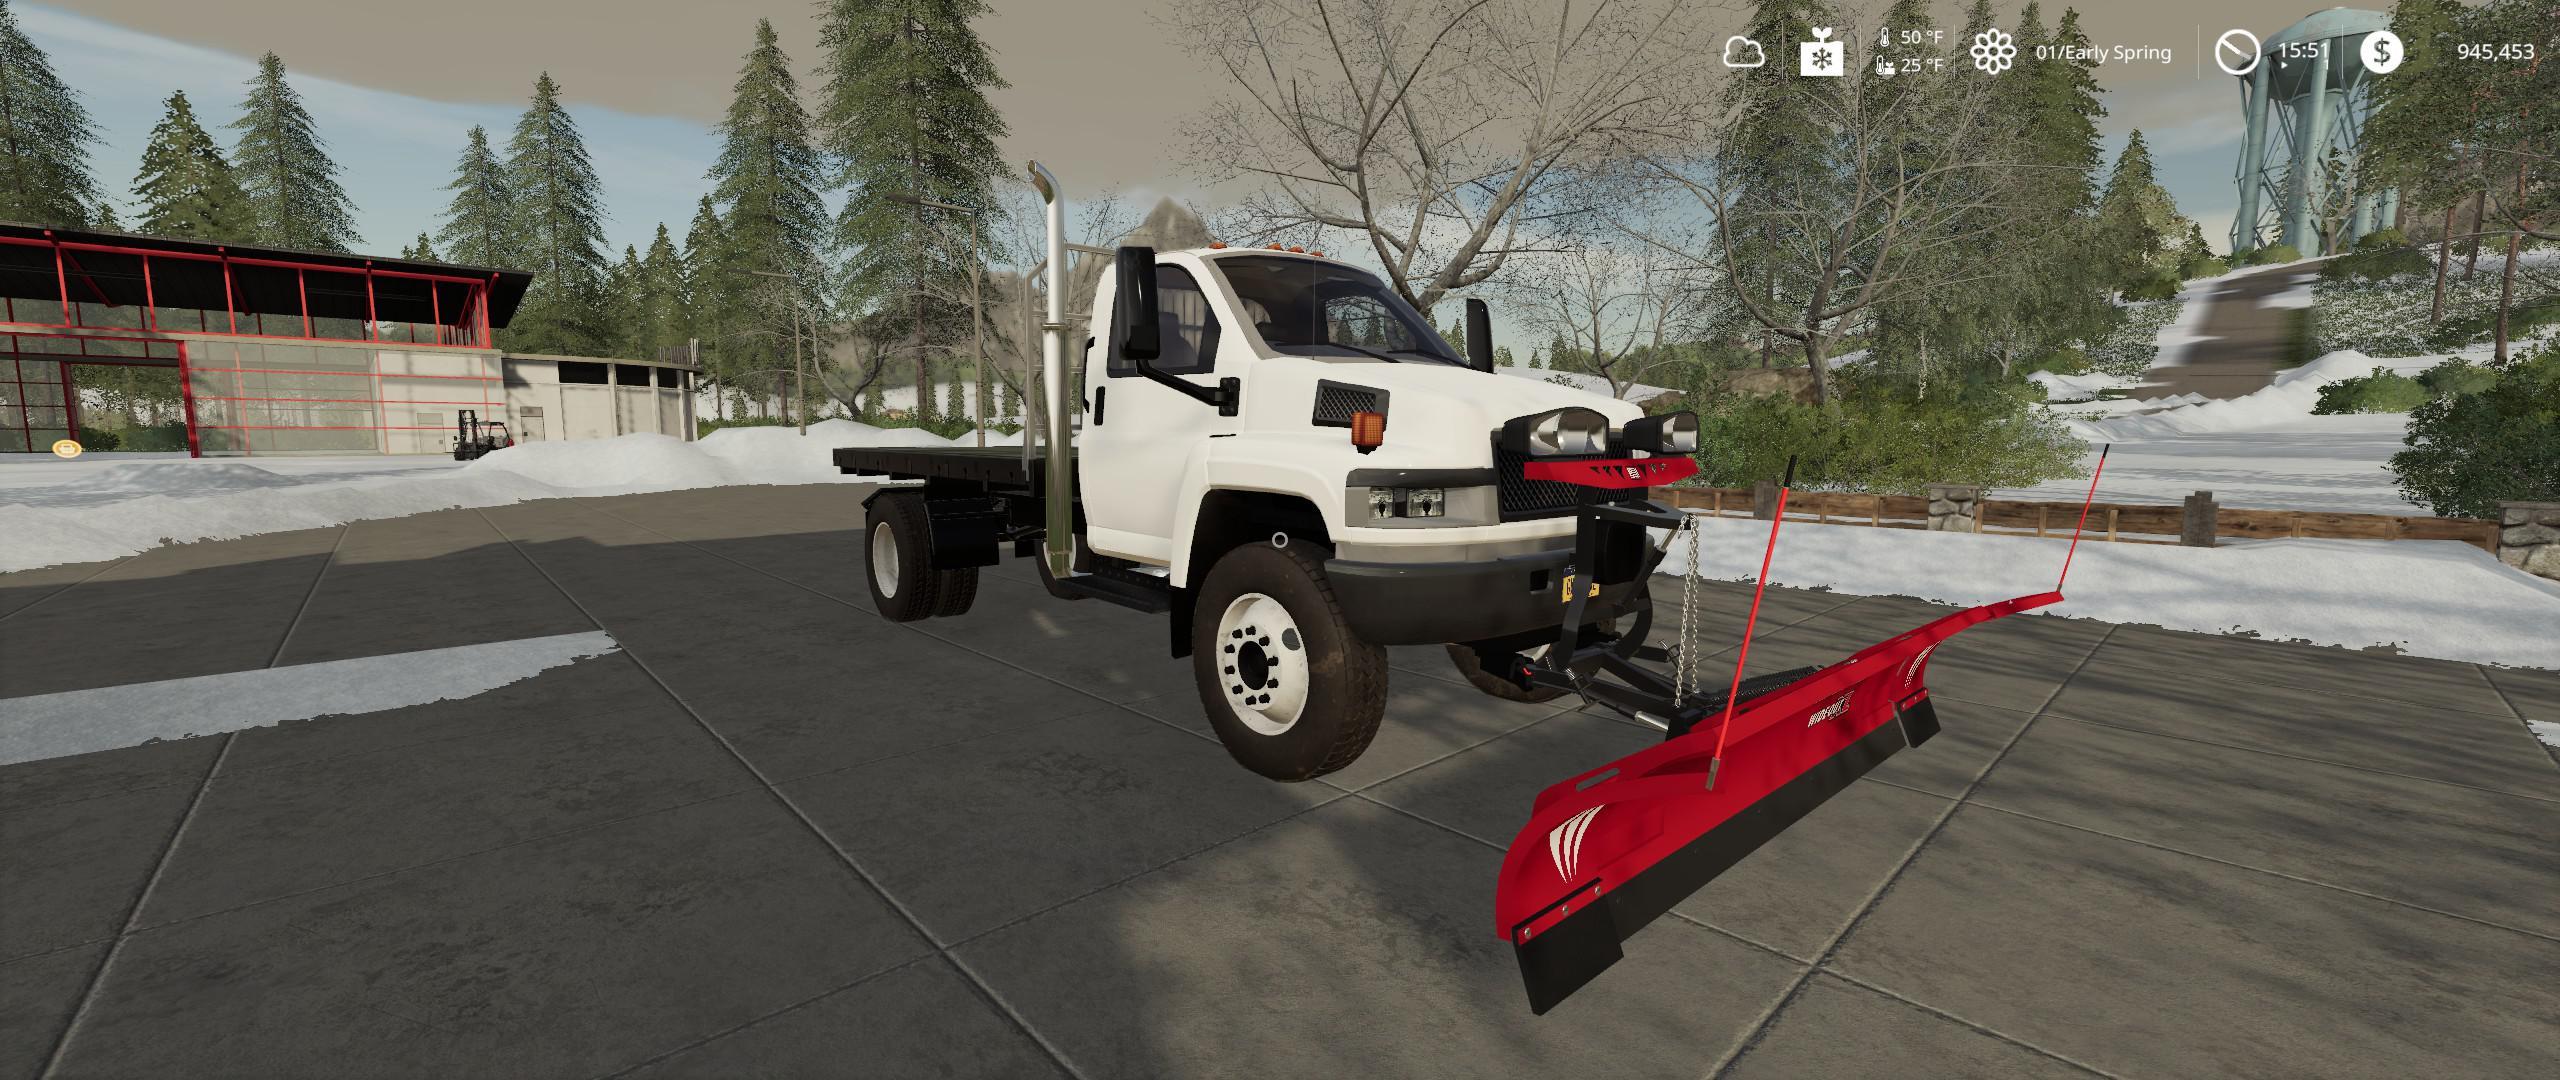 FS19 - GMC Topkick Flatbed Plow Truck v2.0